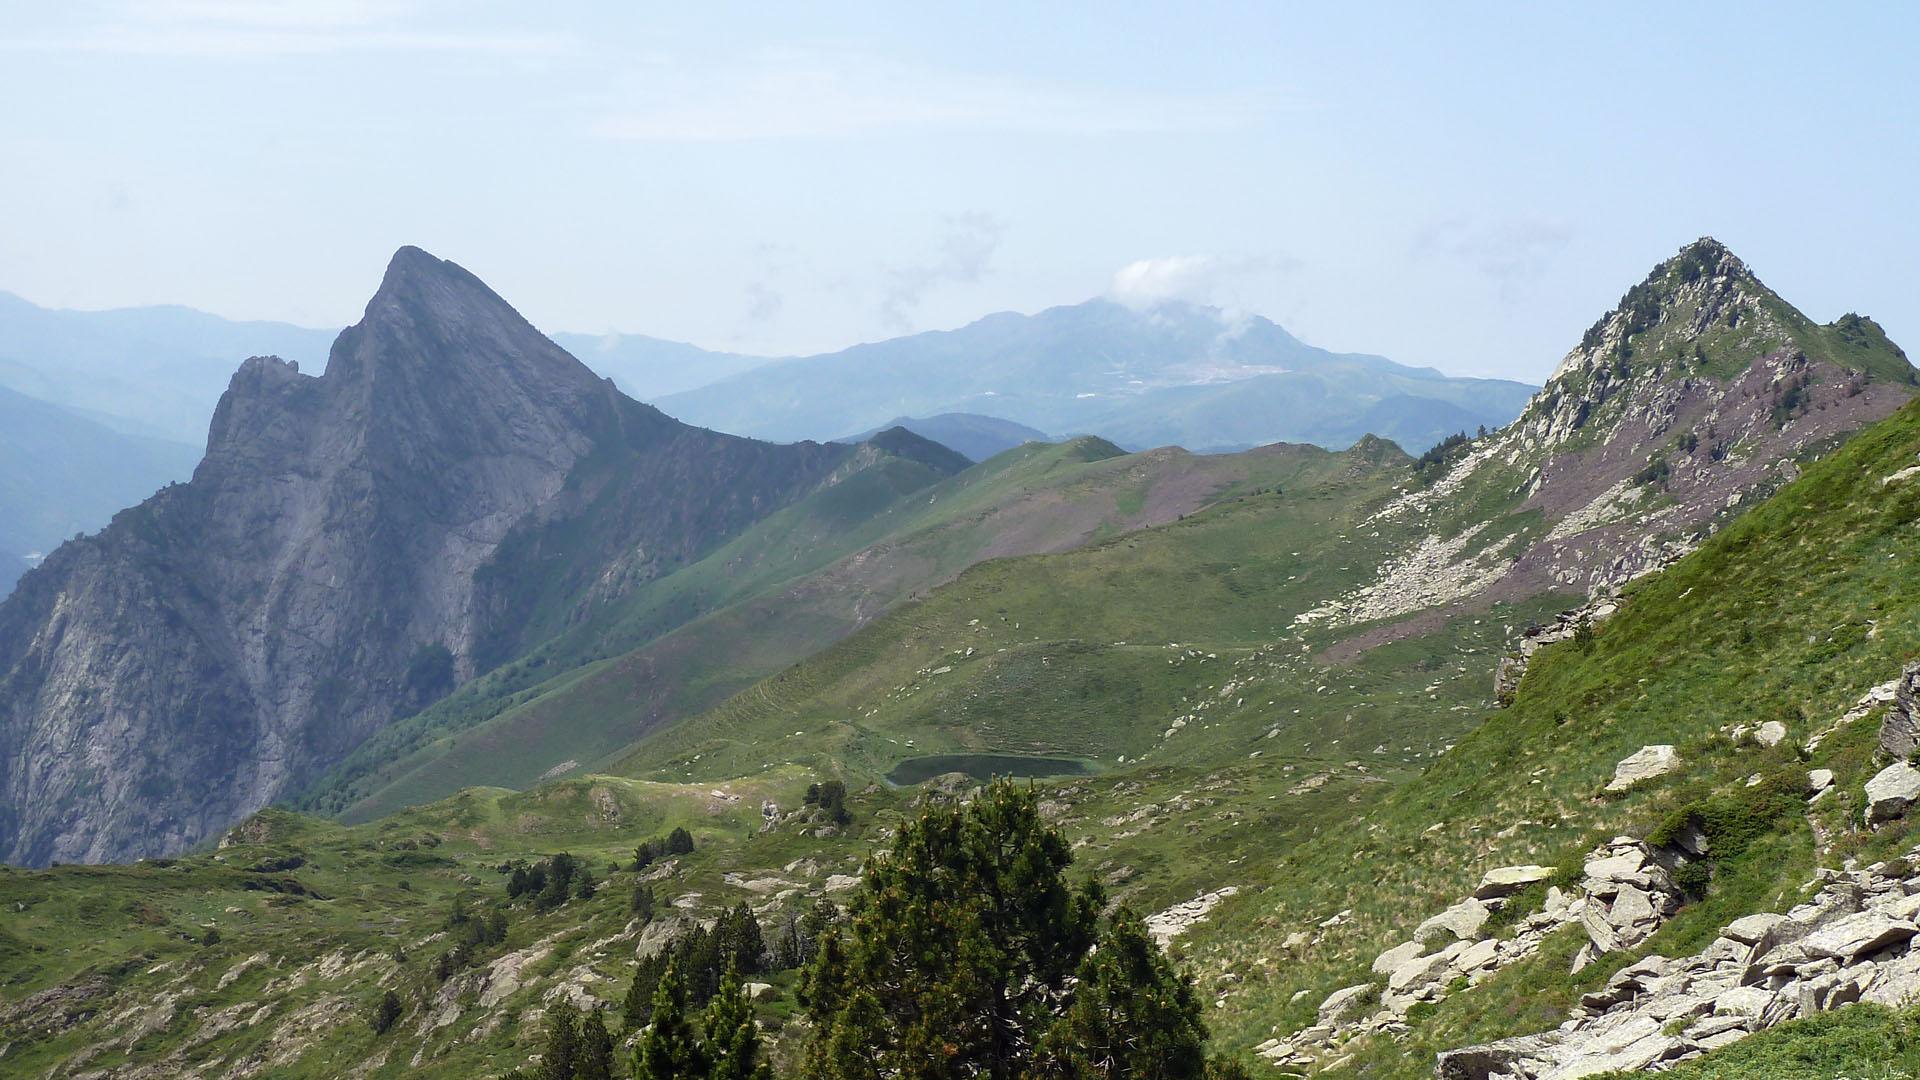 Vallée d'Orlu, Puig Péric, Camporells